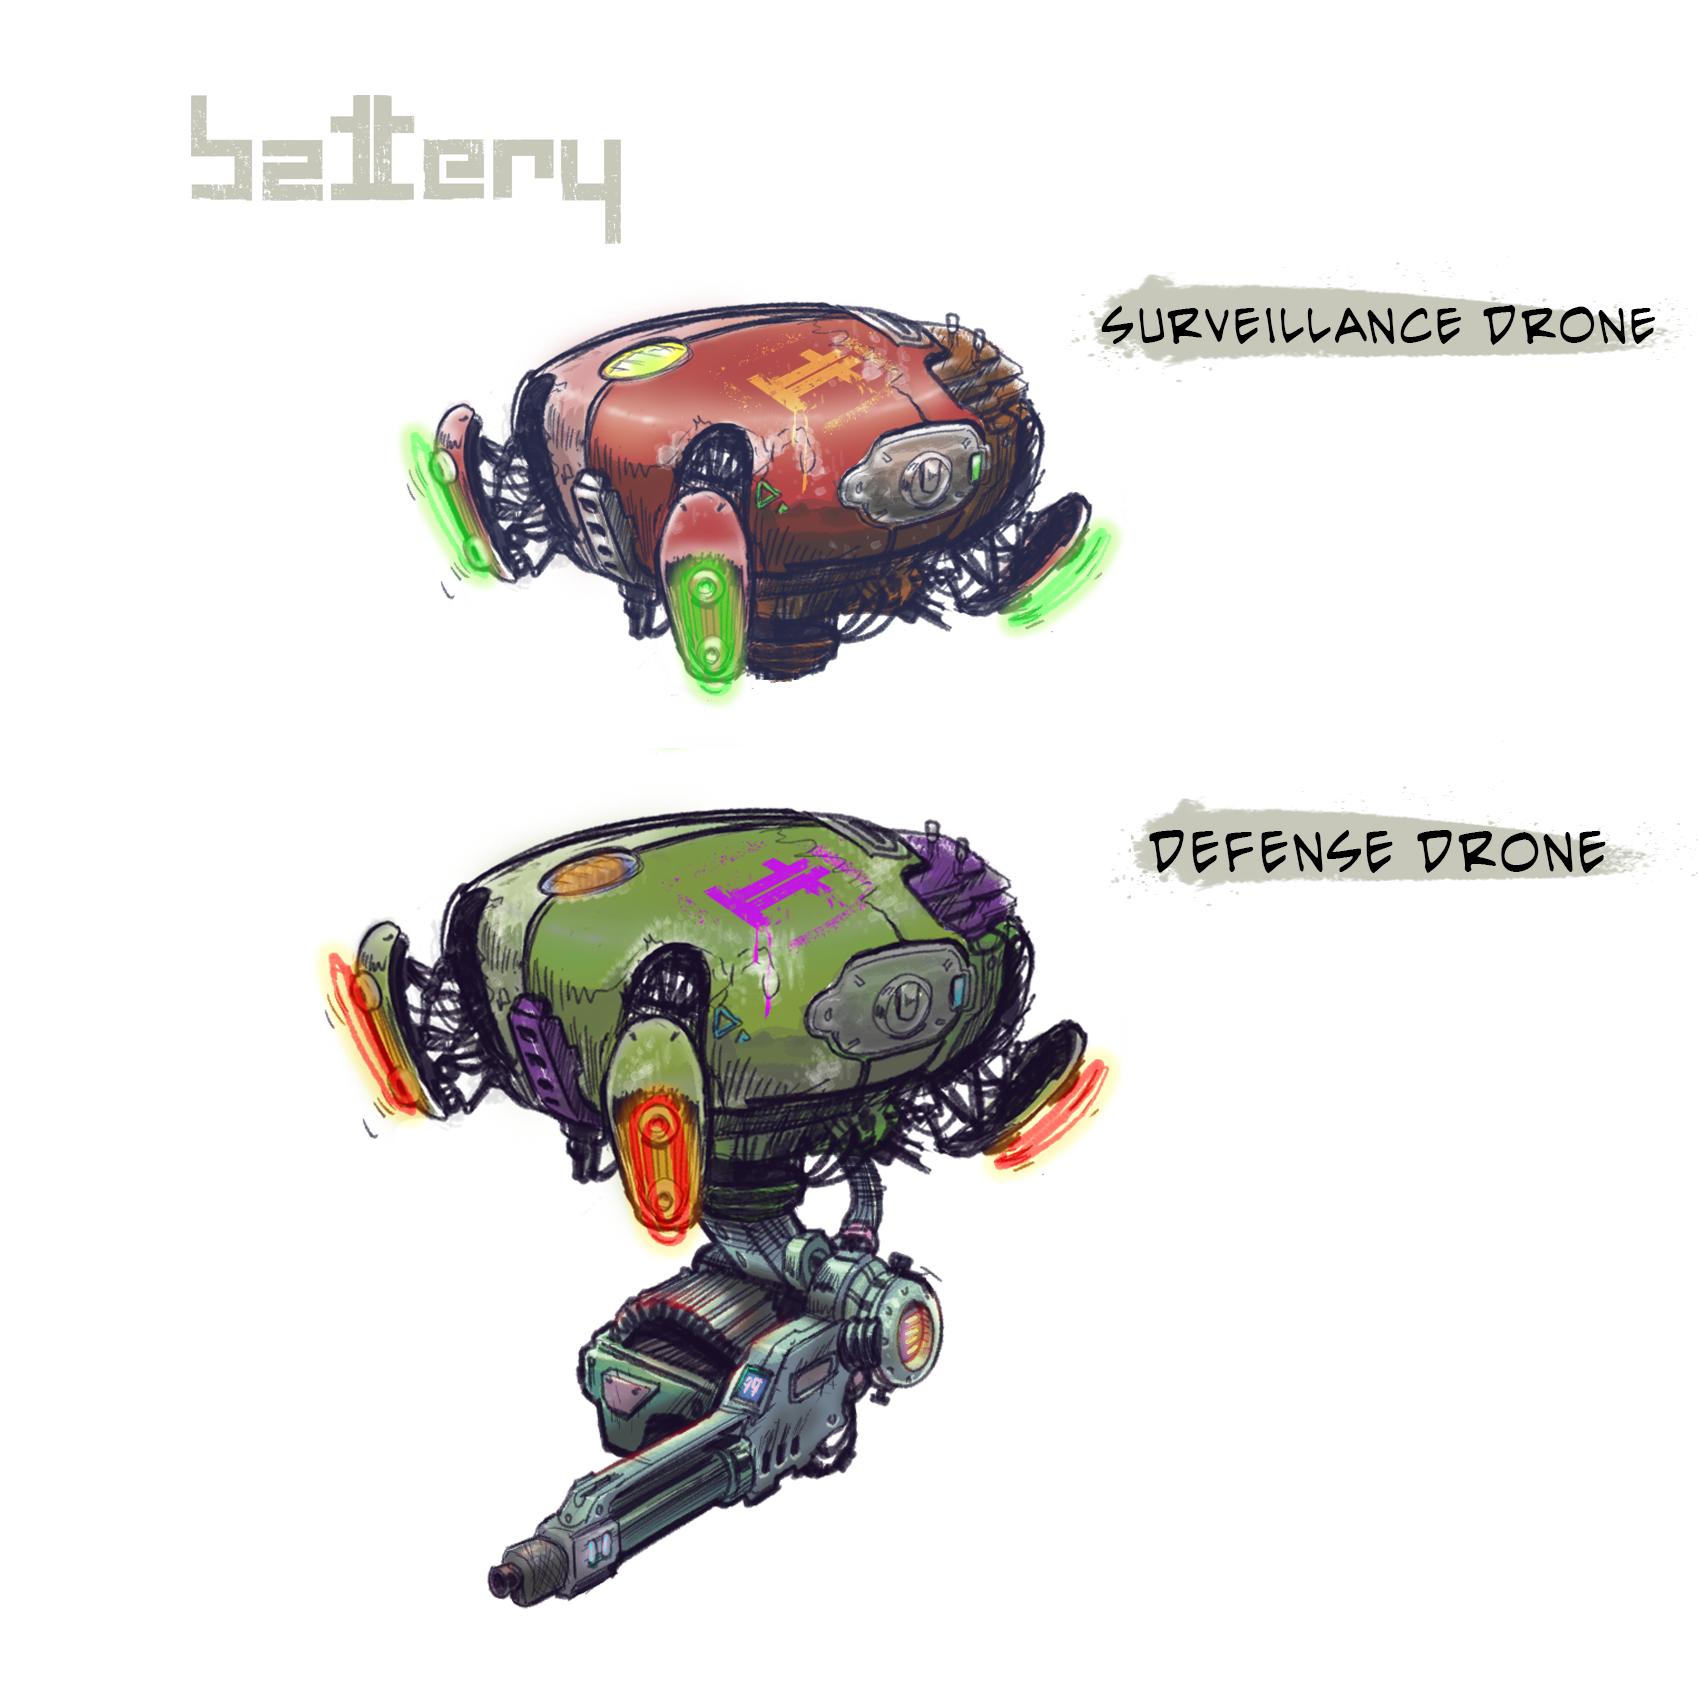 Battery - Drones